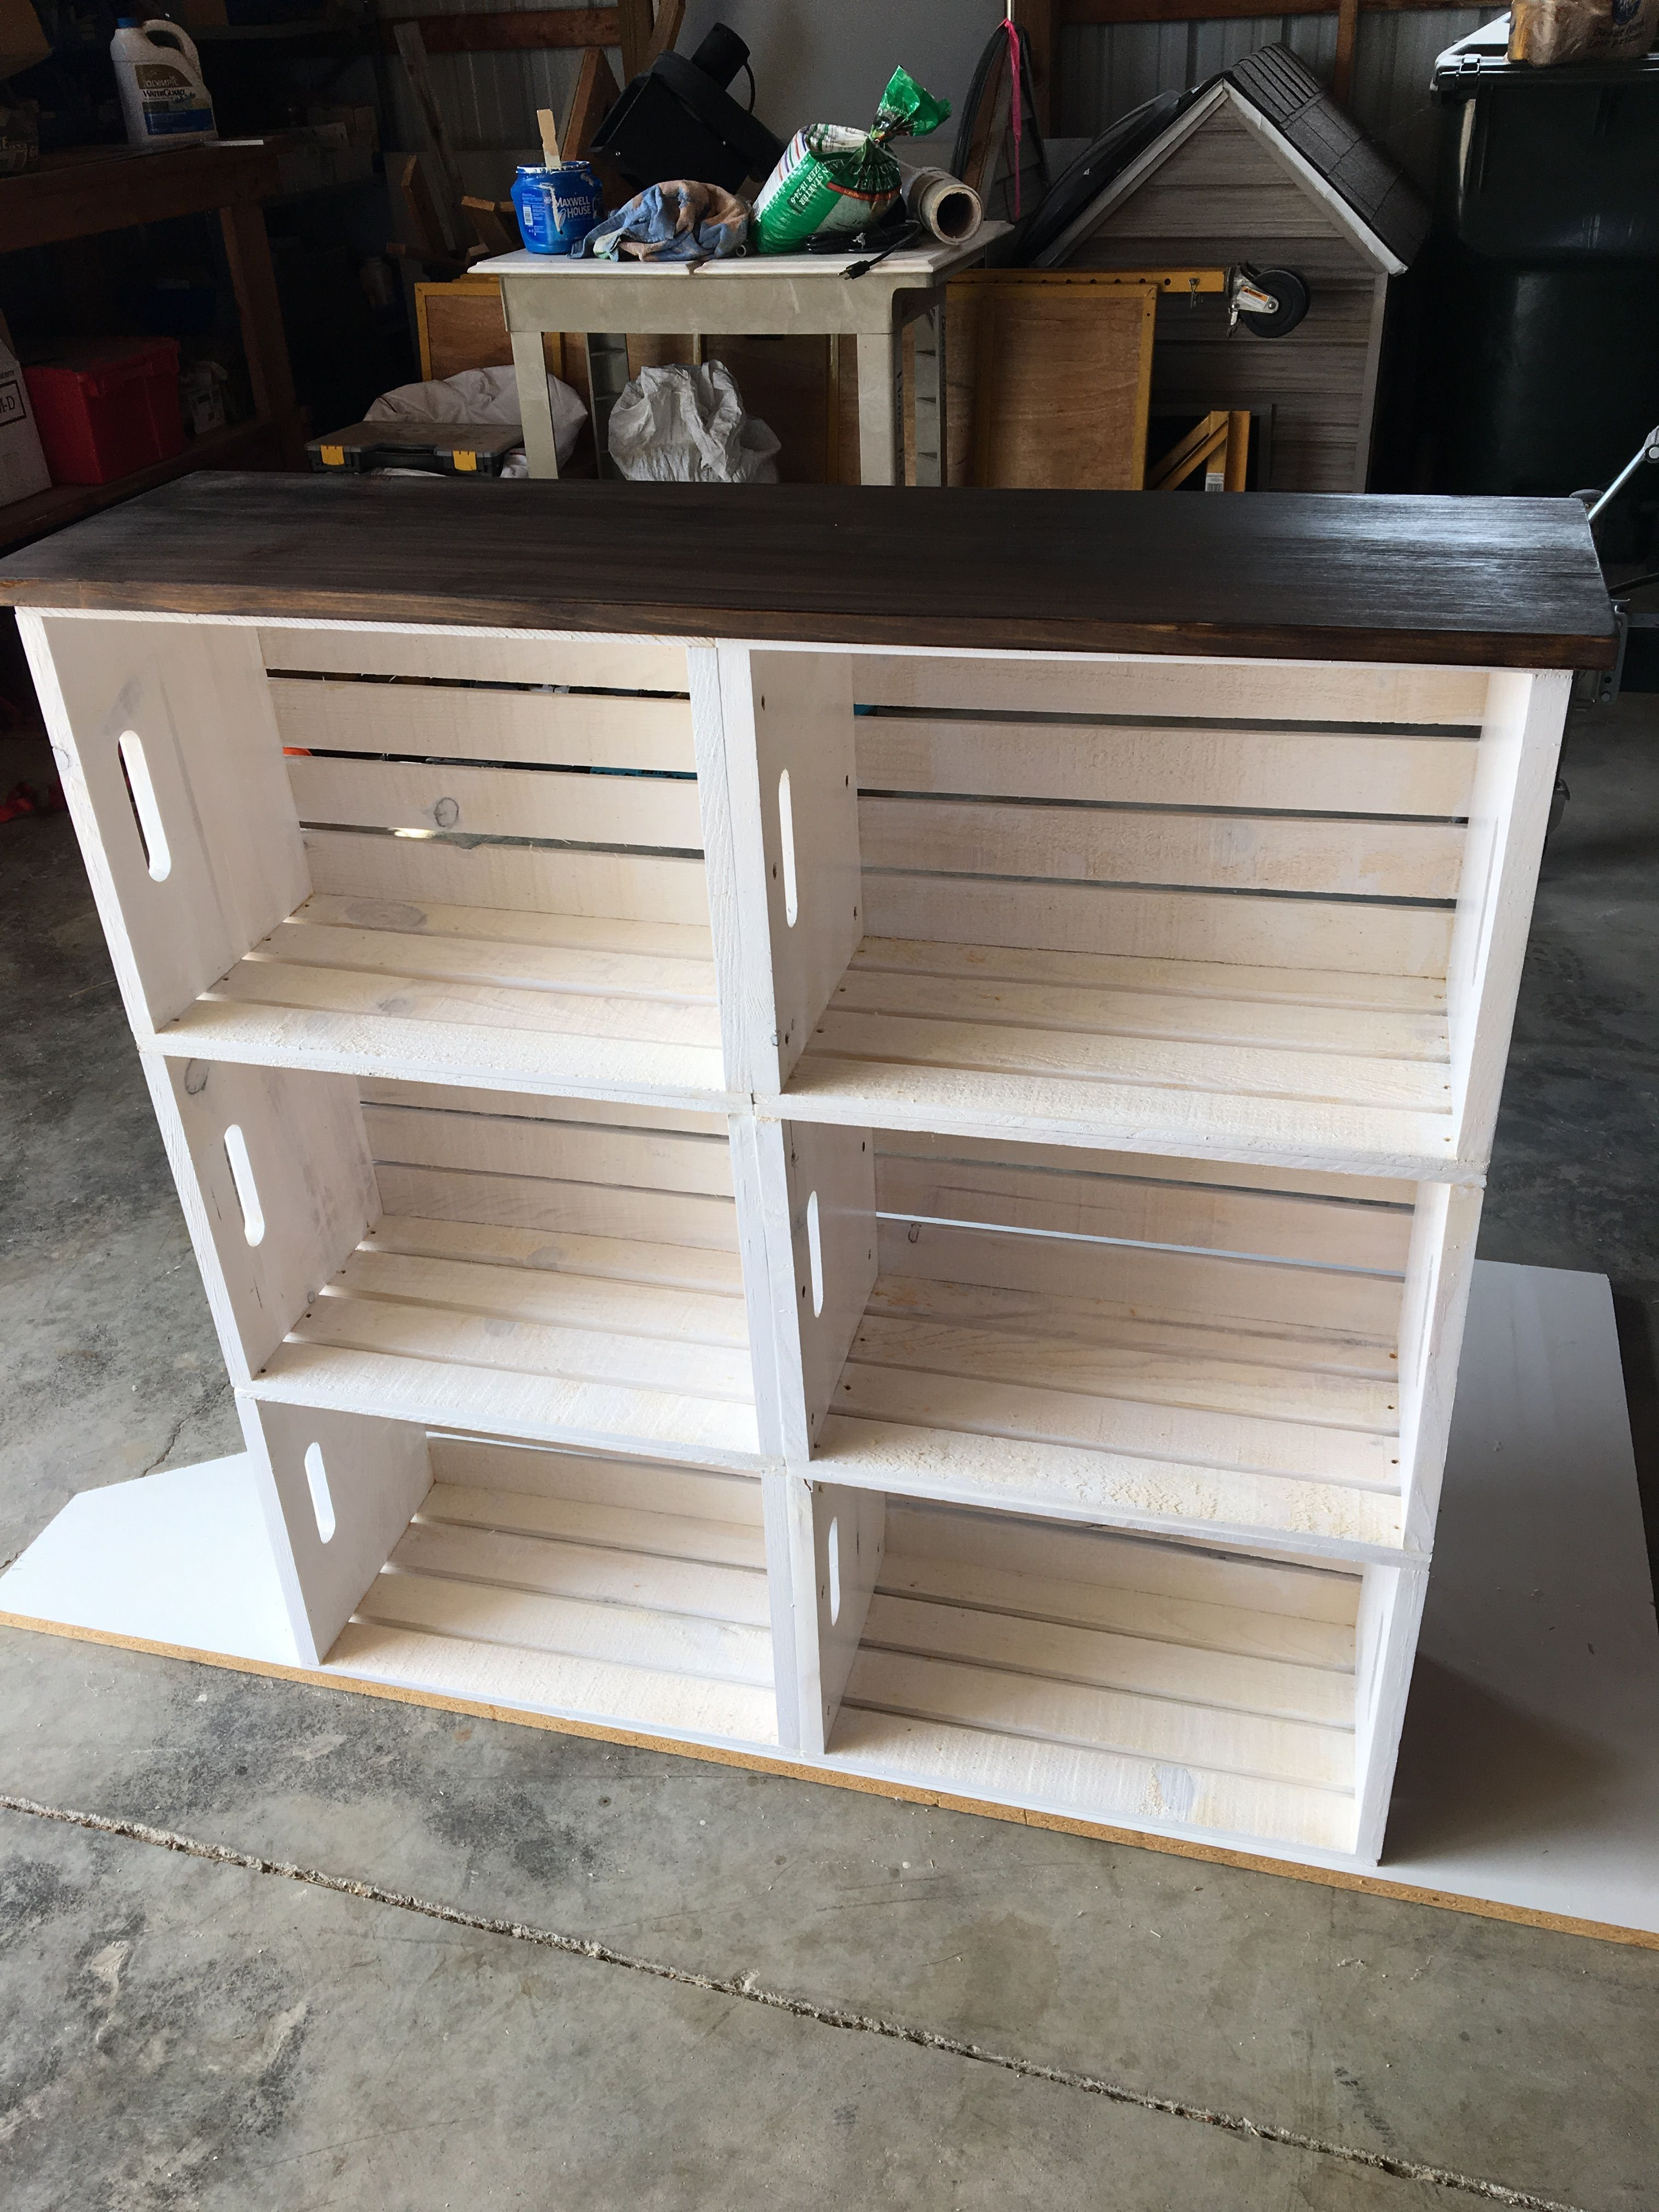 bookcase idea decor diy home decor home decor crate furniture rh pinterest com